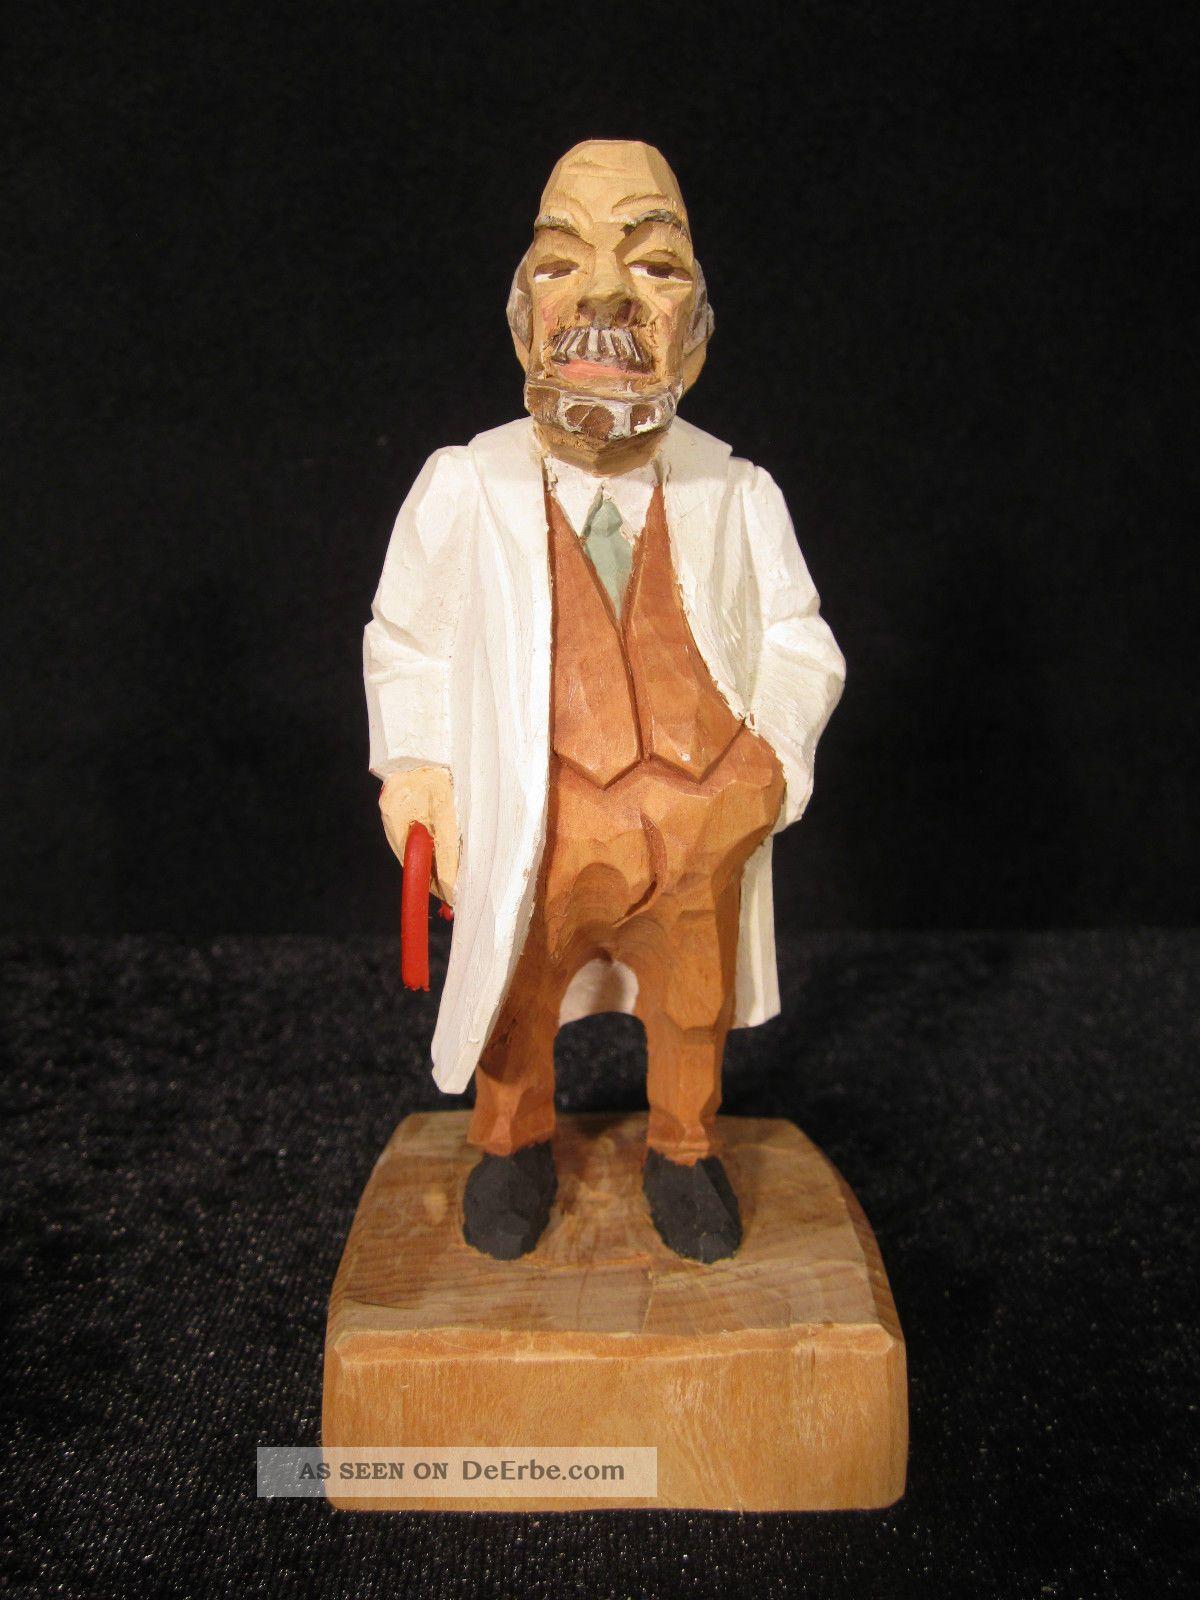 Magen - Arzt,  Doktor,  Dr.  Med.  Handgeschnitzt Zirbelholz Ca 14,  5 Cm,  Farbig Bemalt Arzt & Apotheker Bild